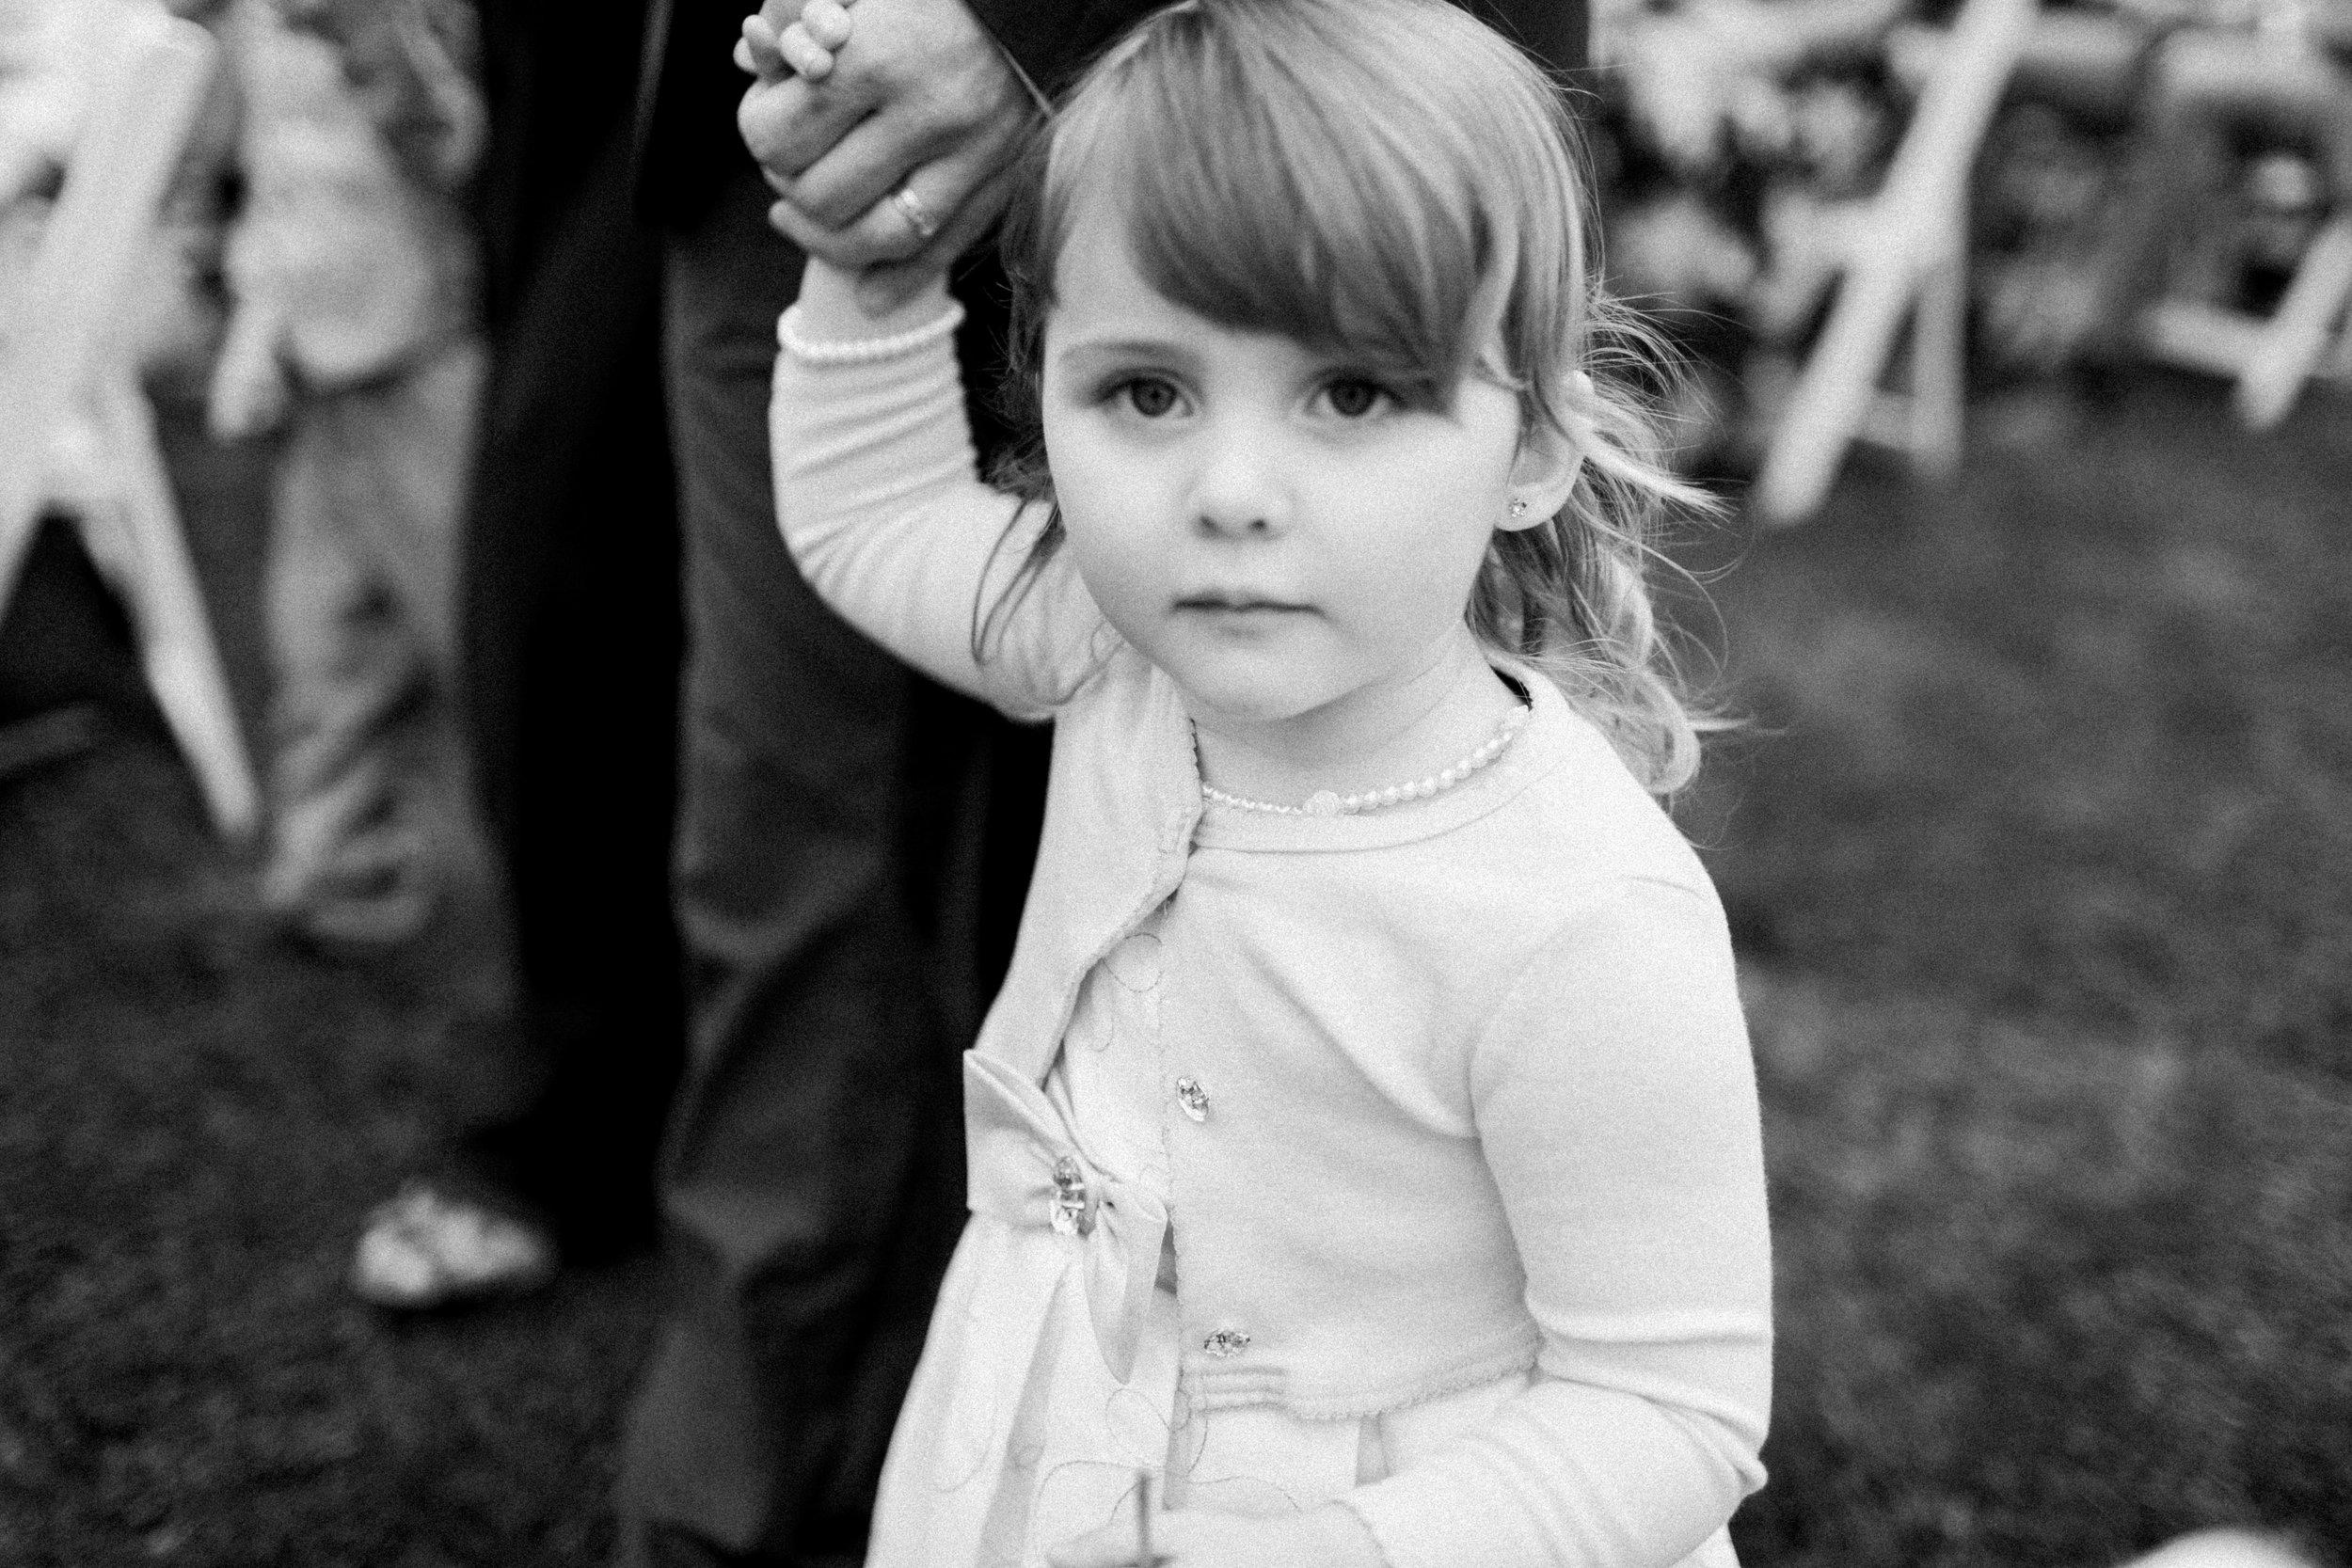 mayden photography weddings-62.jpg